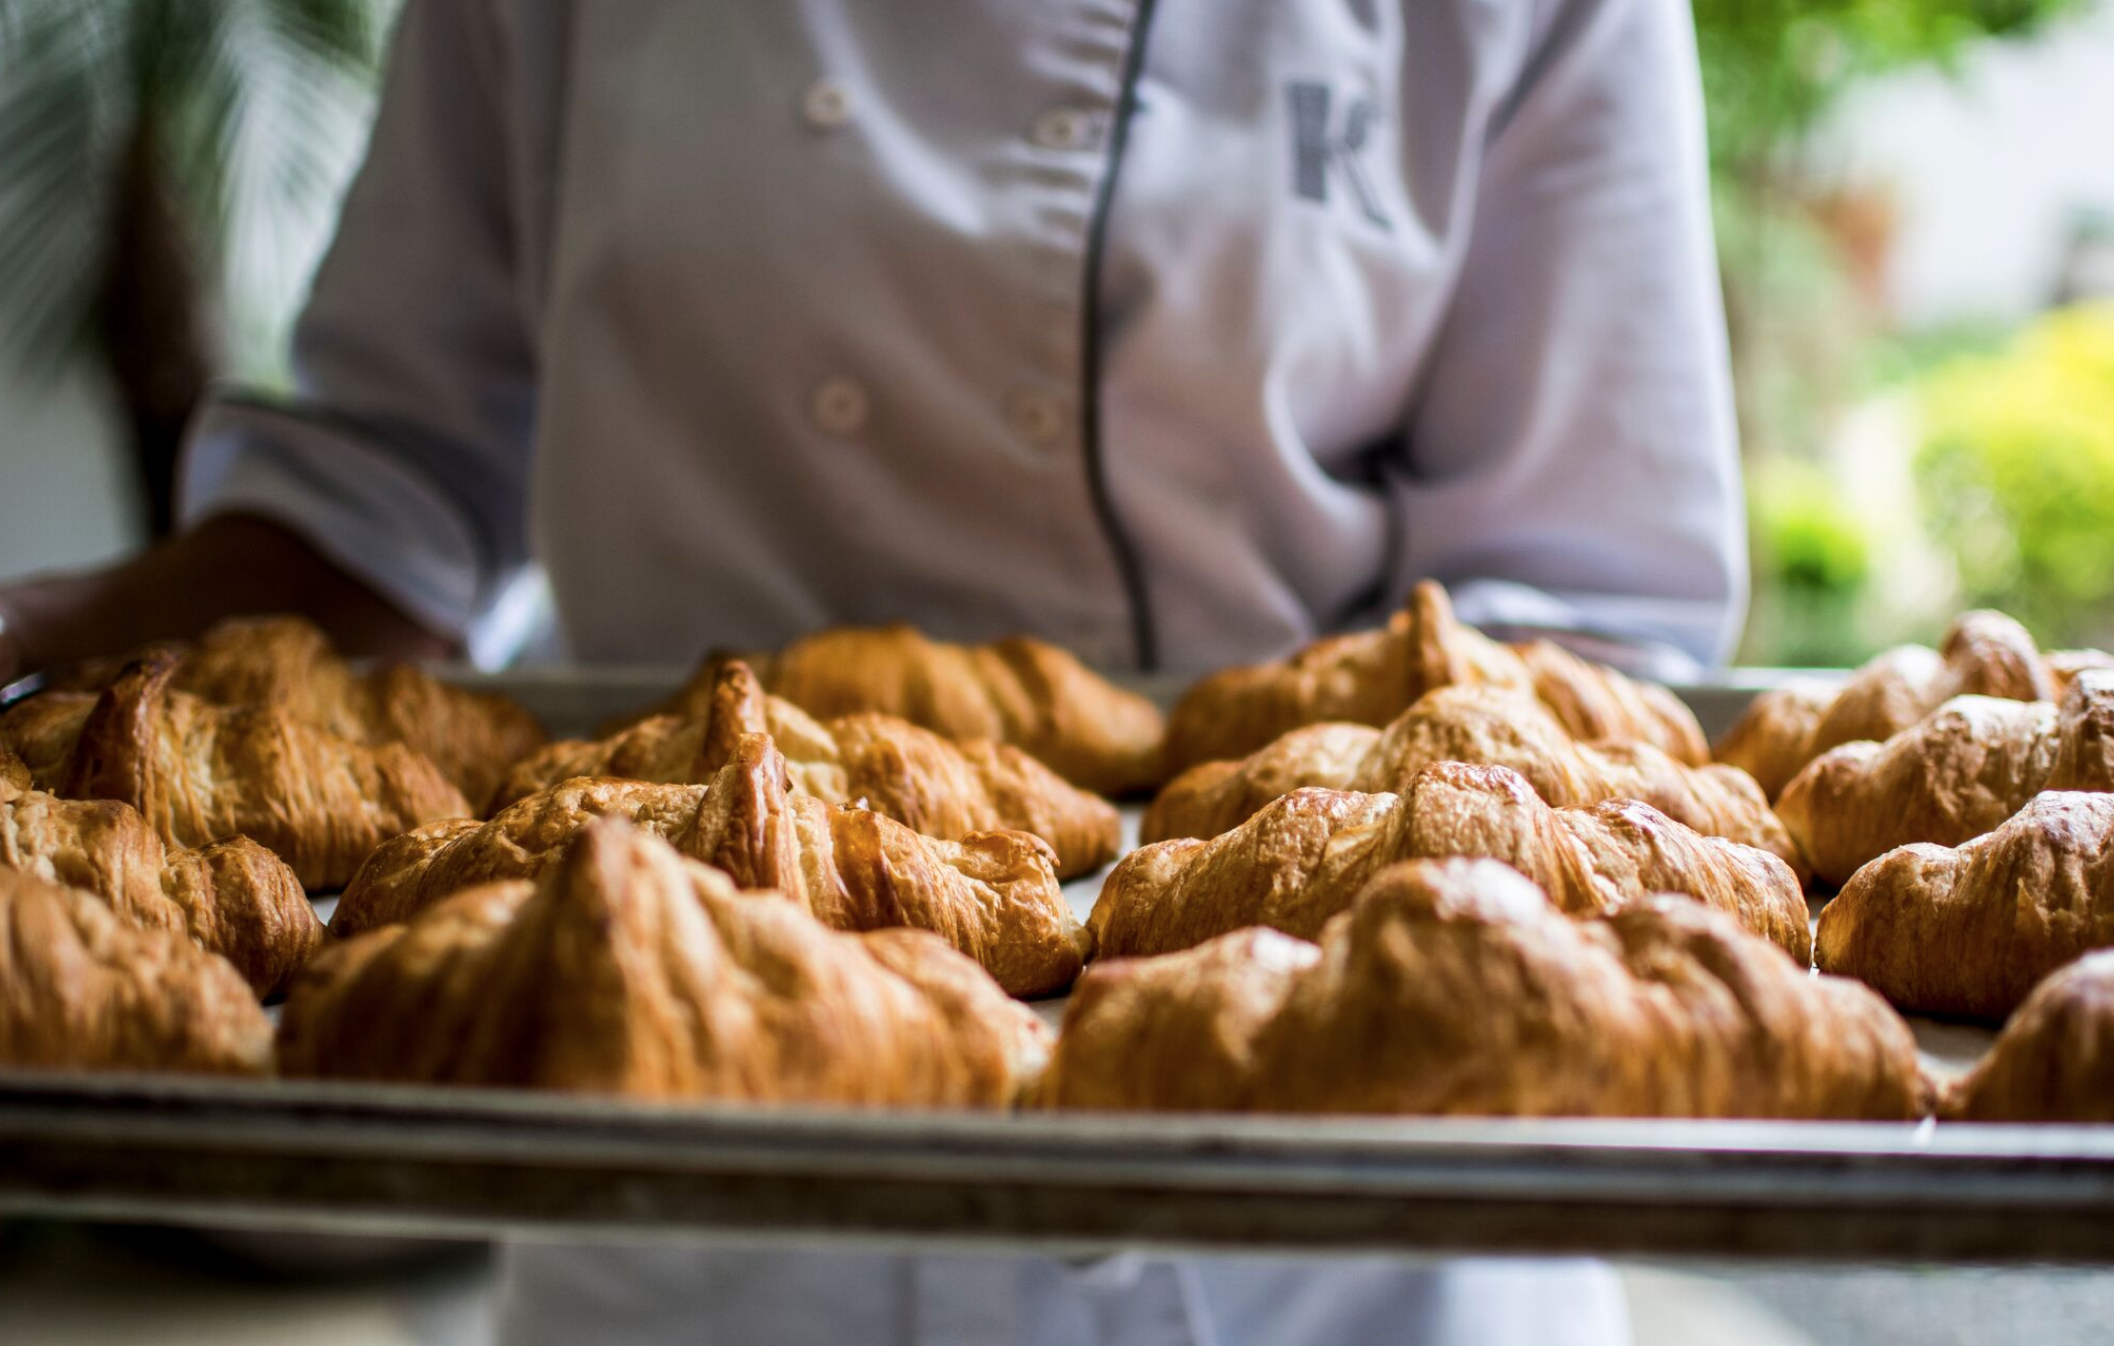 Croissants saliendo del horno!!! mmmmm....